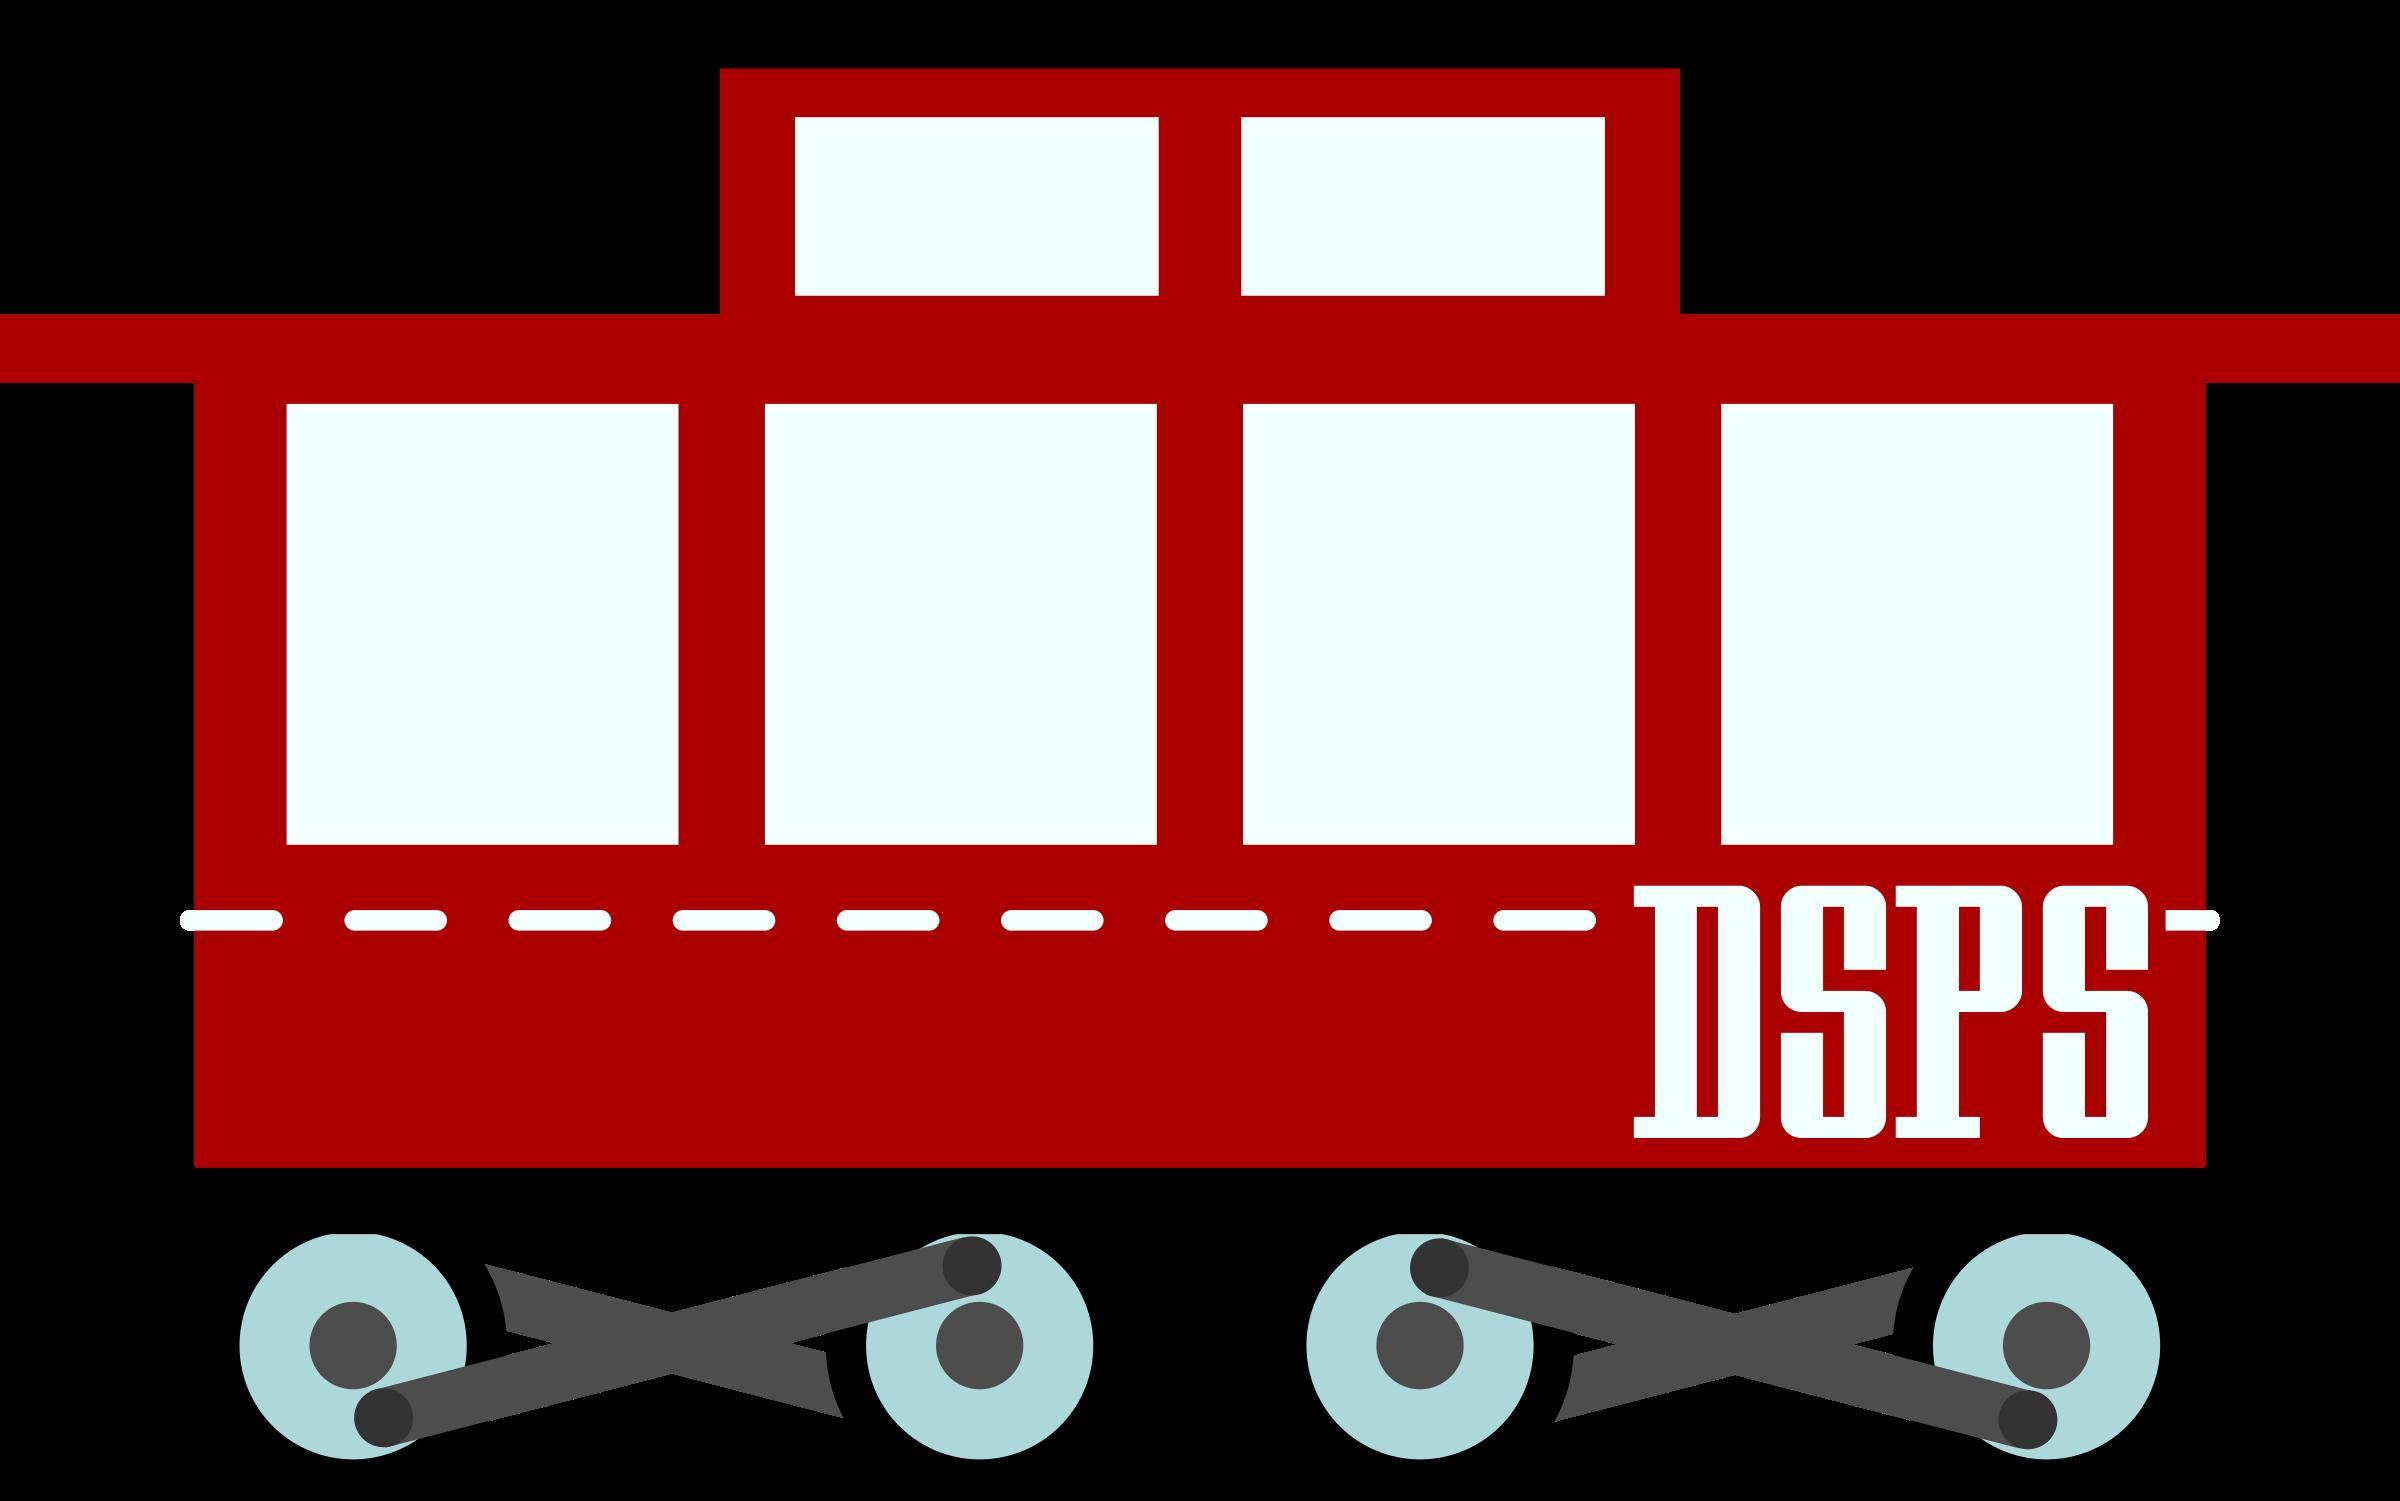 Passenger train car clipart jpg download 28+ Collection of Passenger Train Car Clipart | High quality, free ... jpg download